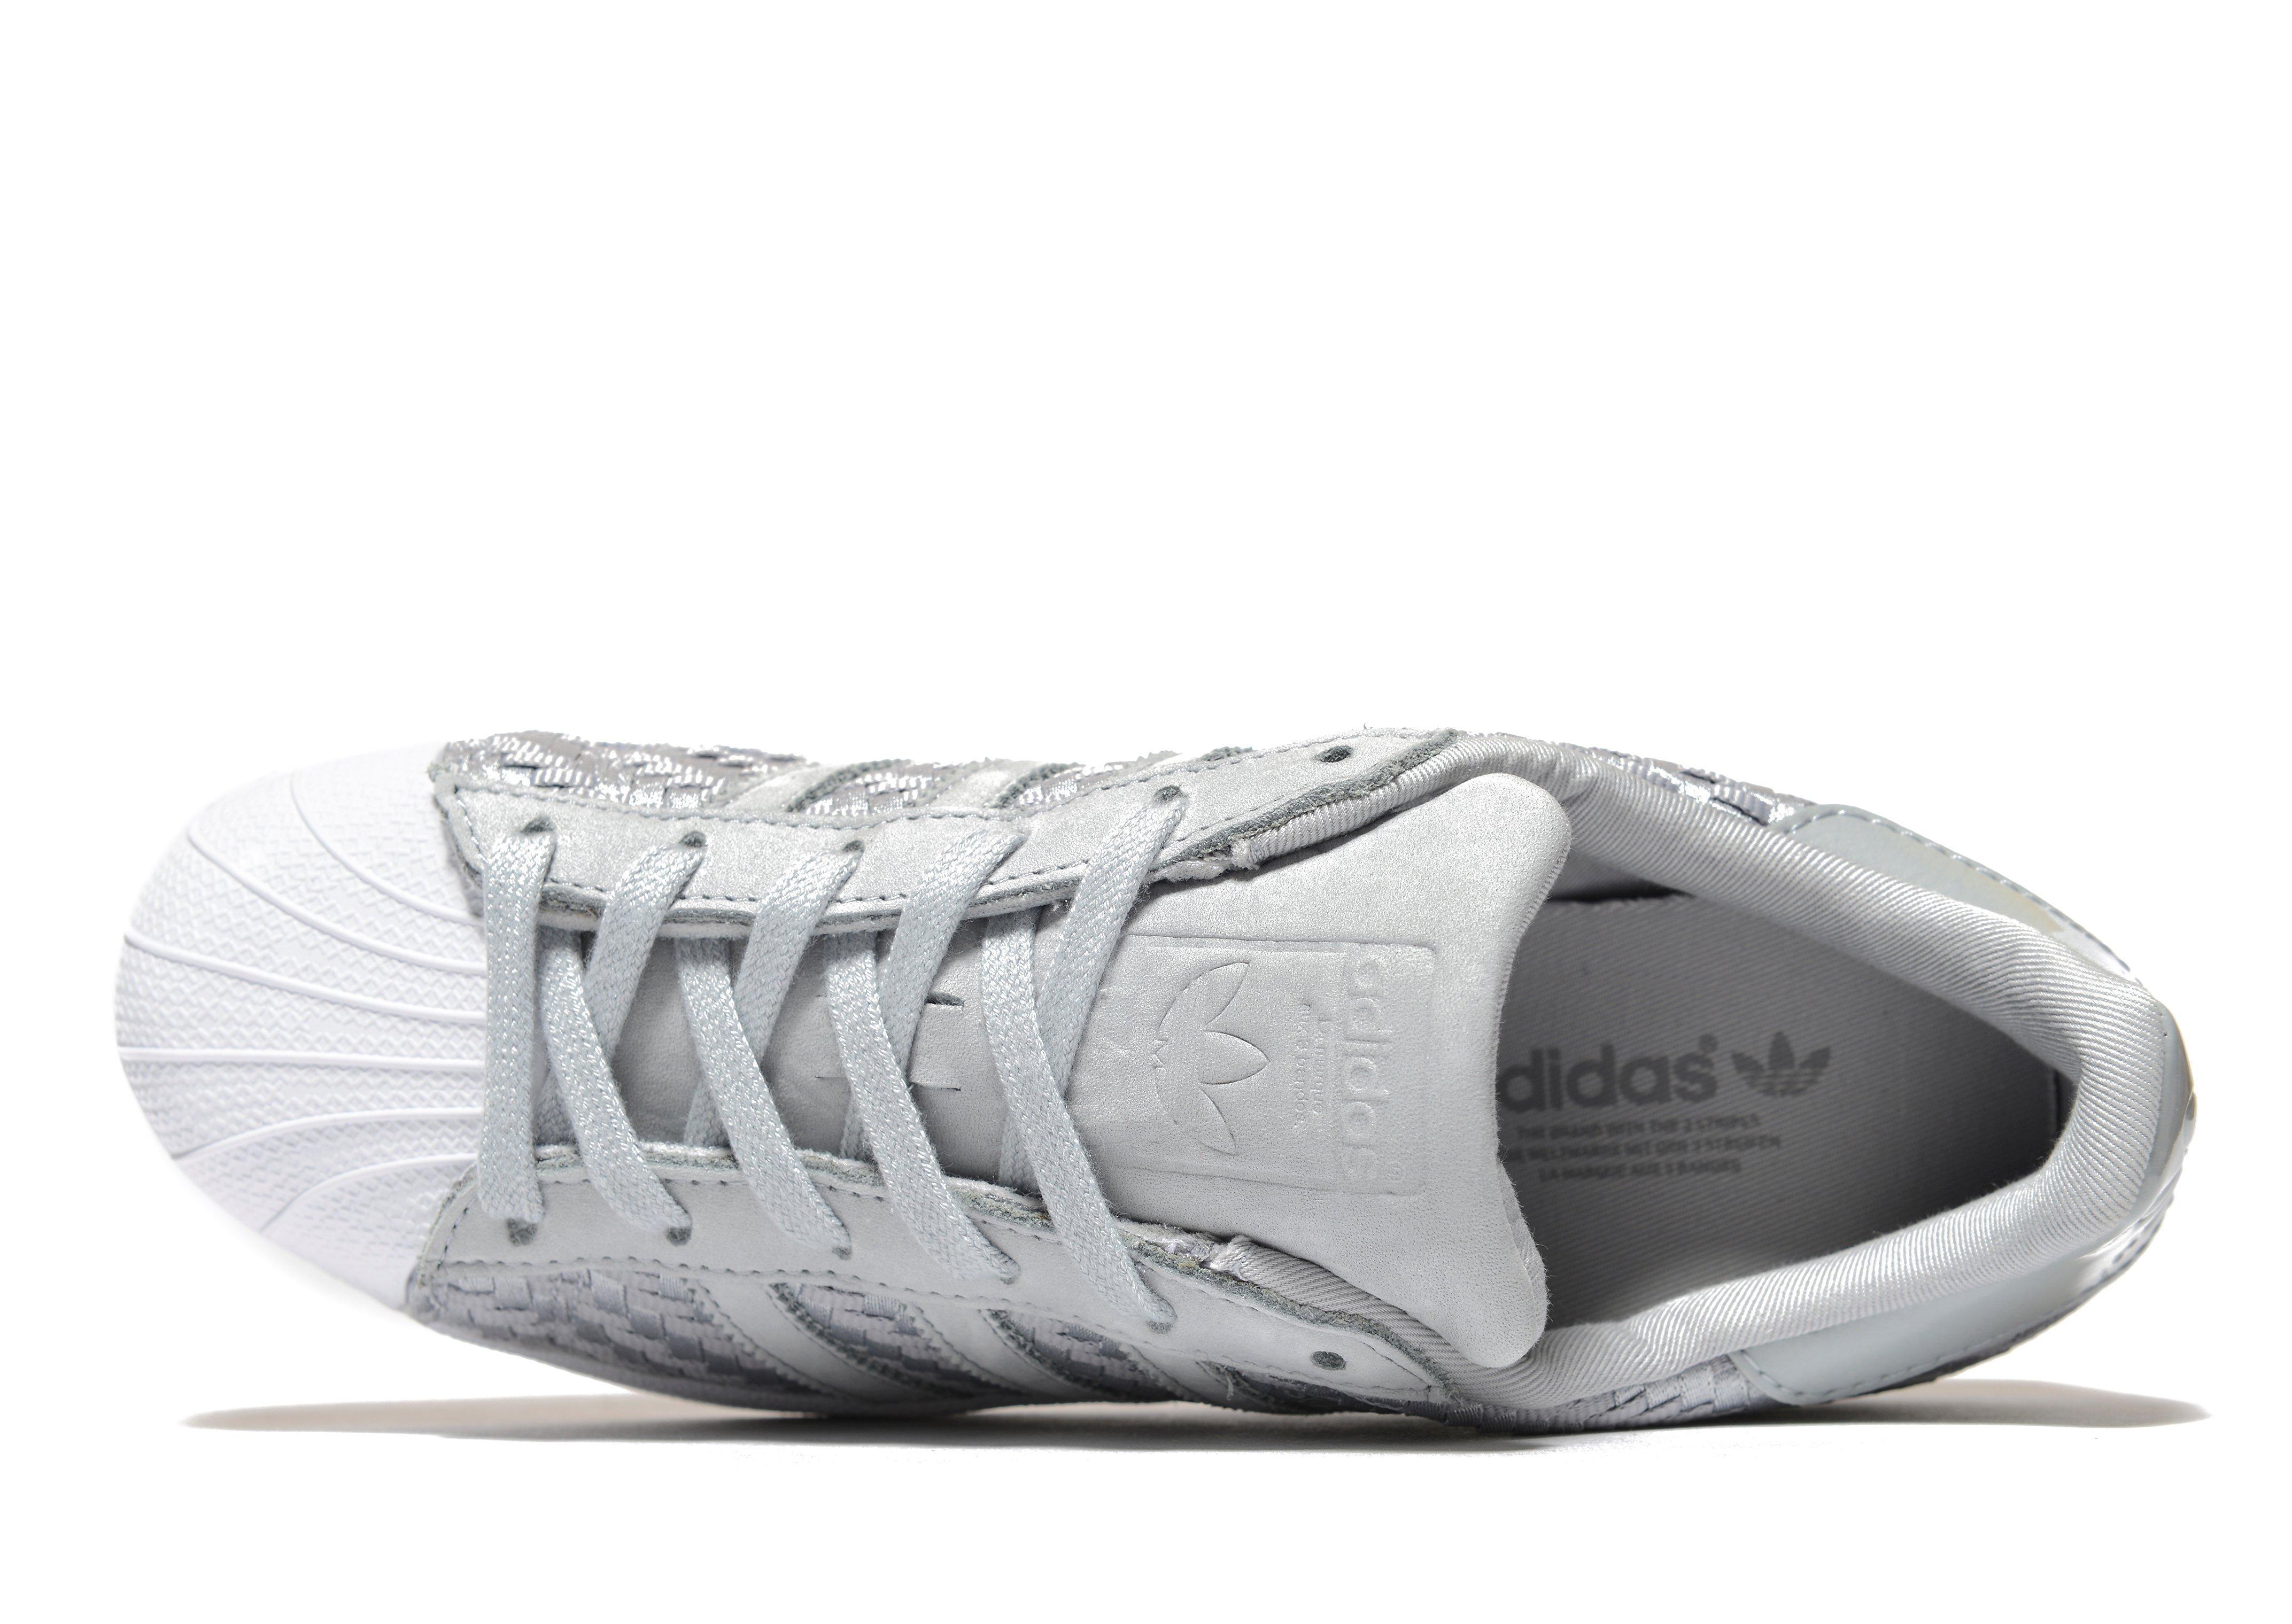 premium selection 84ca2 716b6 ... coupon code lyst adidas originals superstar woven in gray 18d32 42c04